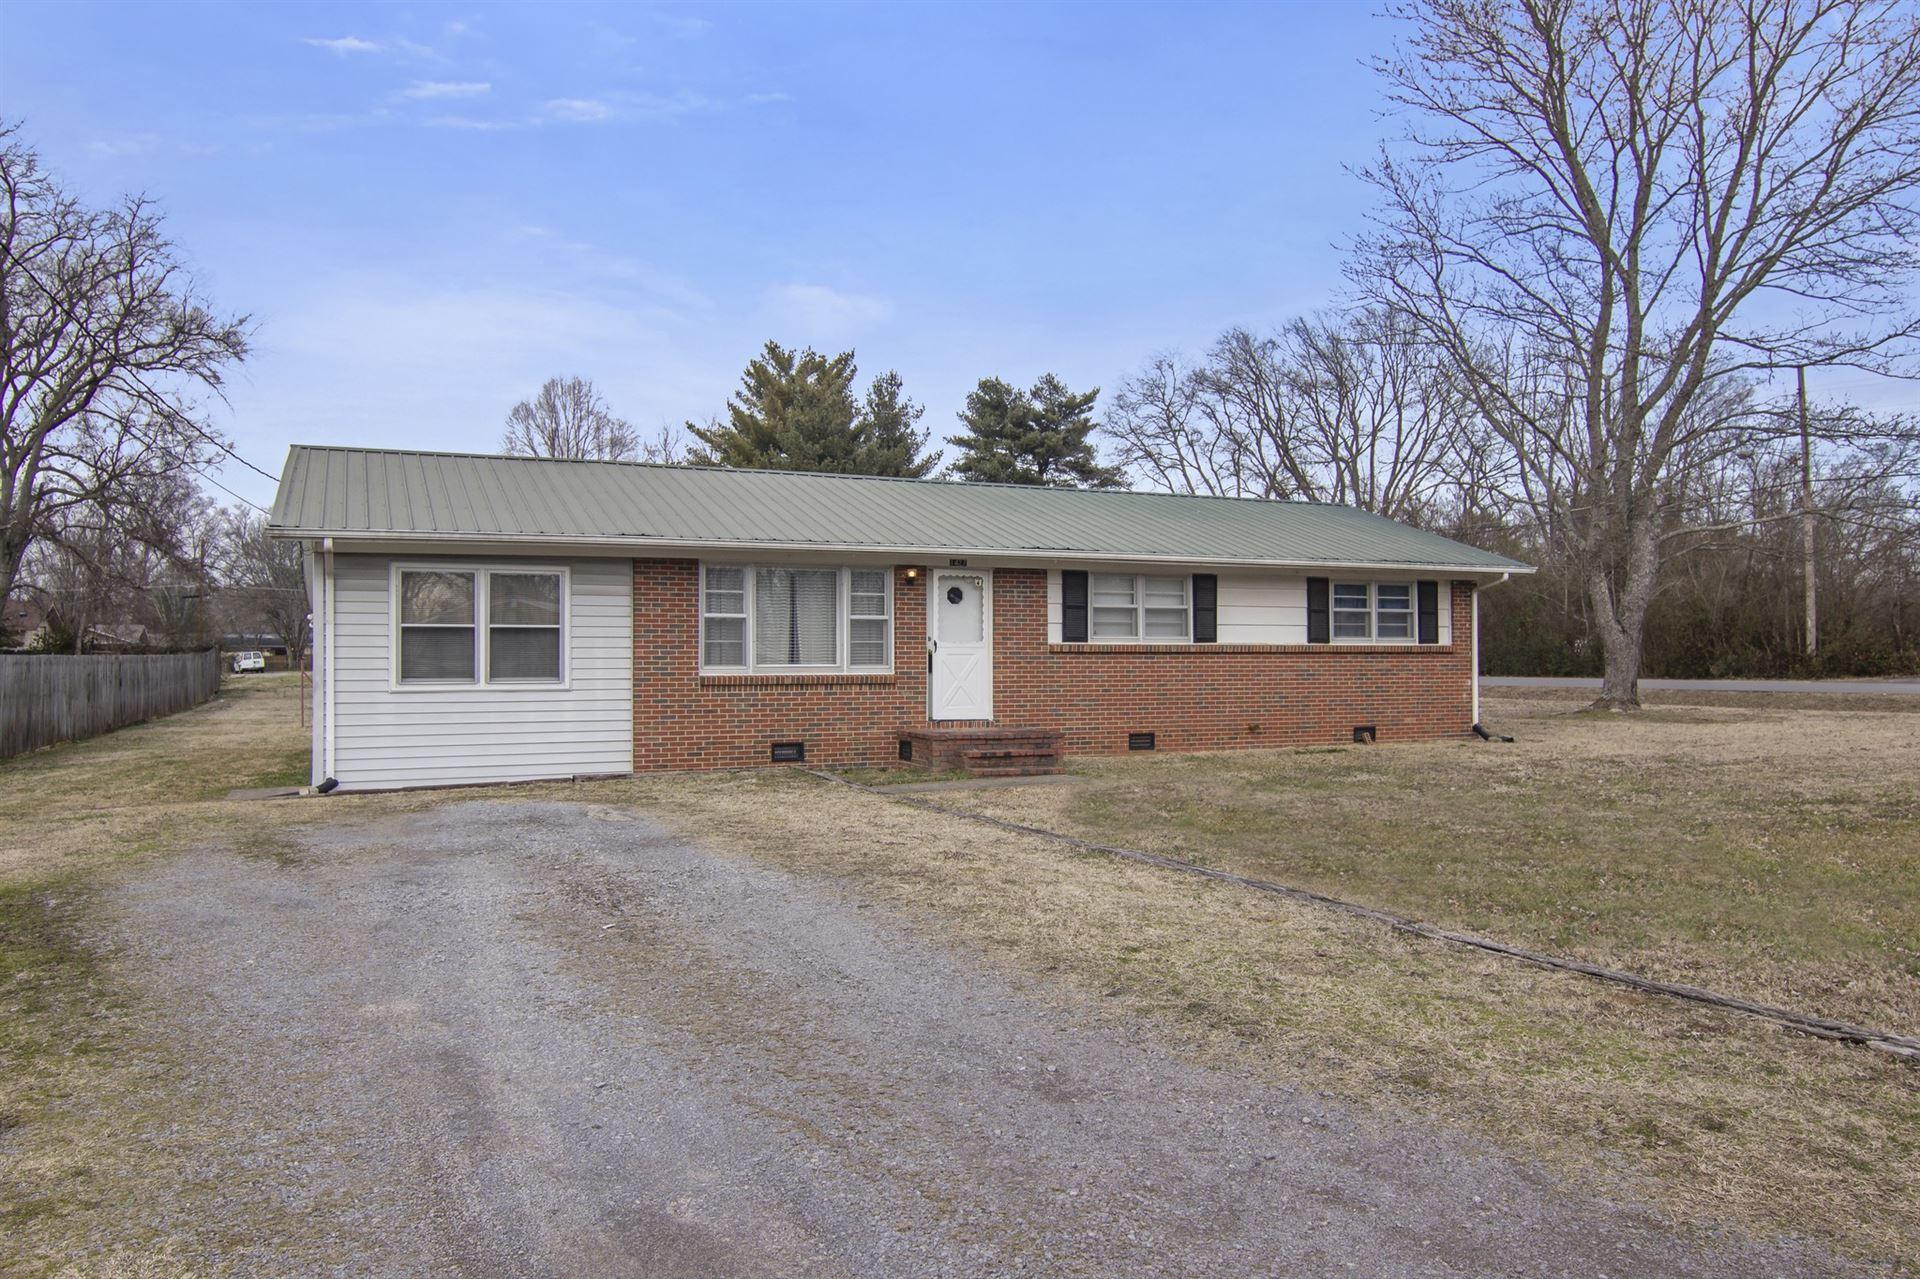 Photo of 1427 Sherrill Blvd, Murfreesboro, TN 37130 (MLS # 2228525)